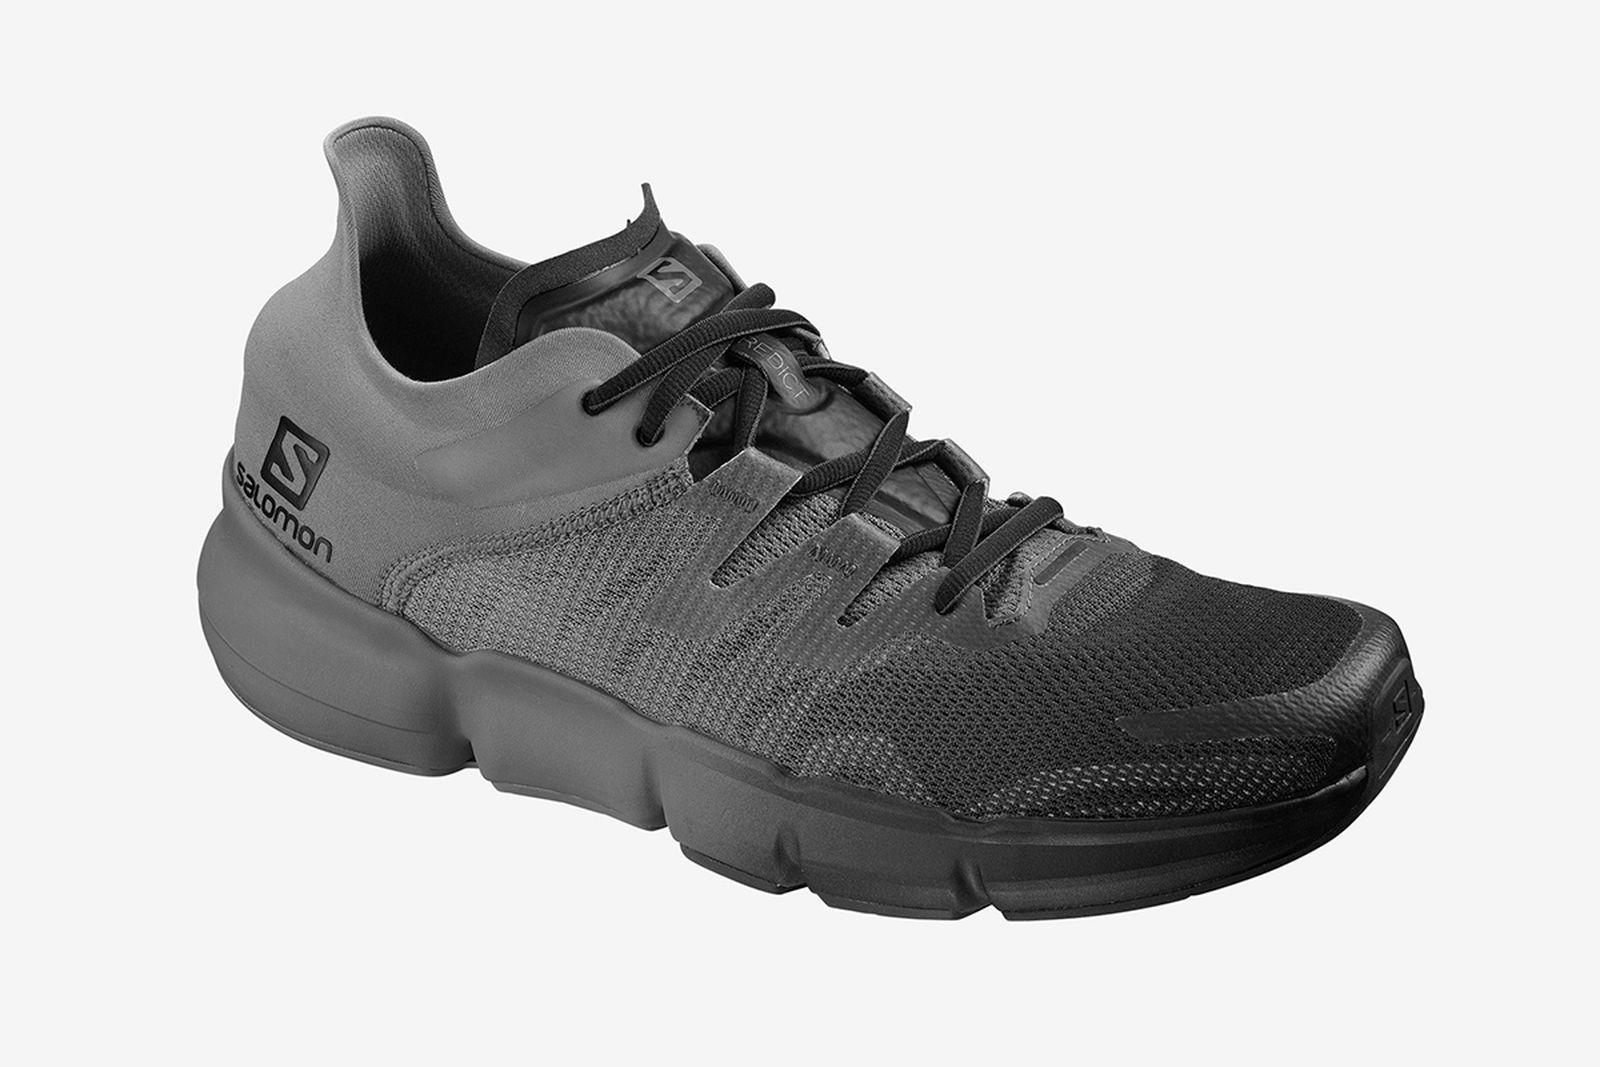 best-running-shoes-for-men-guide-salomon-predict-a